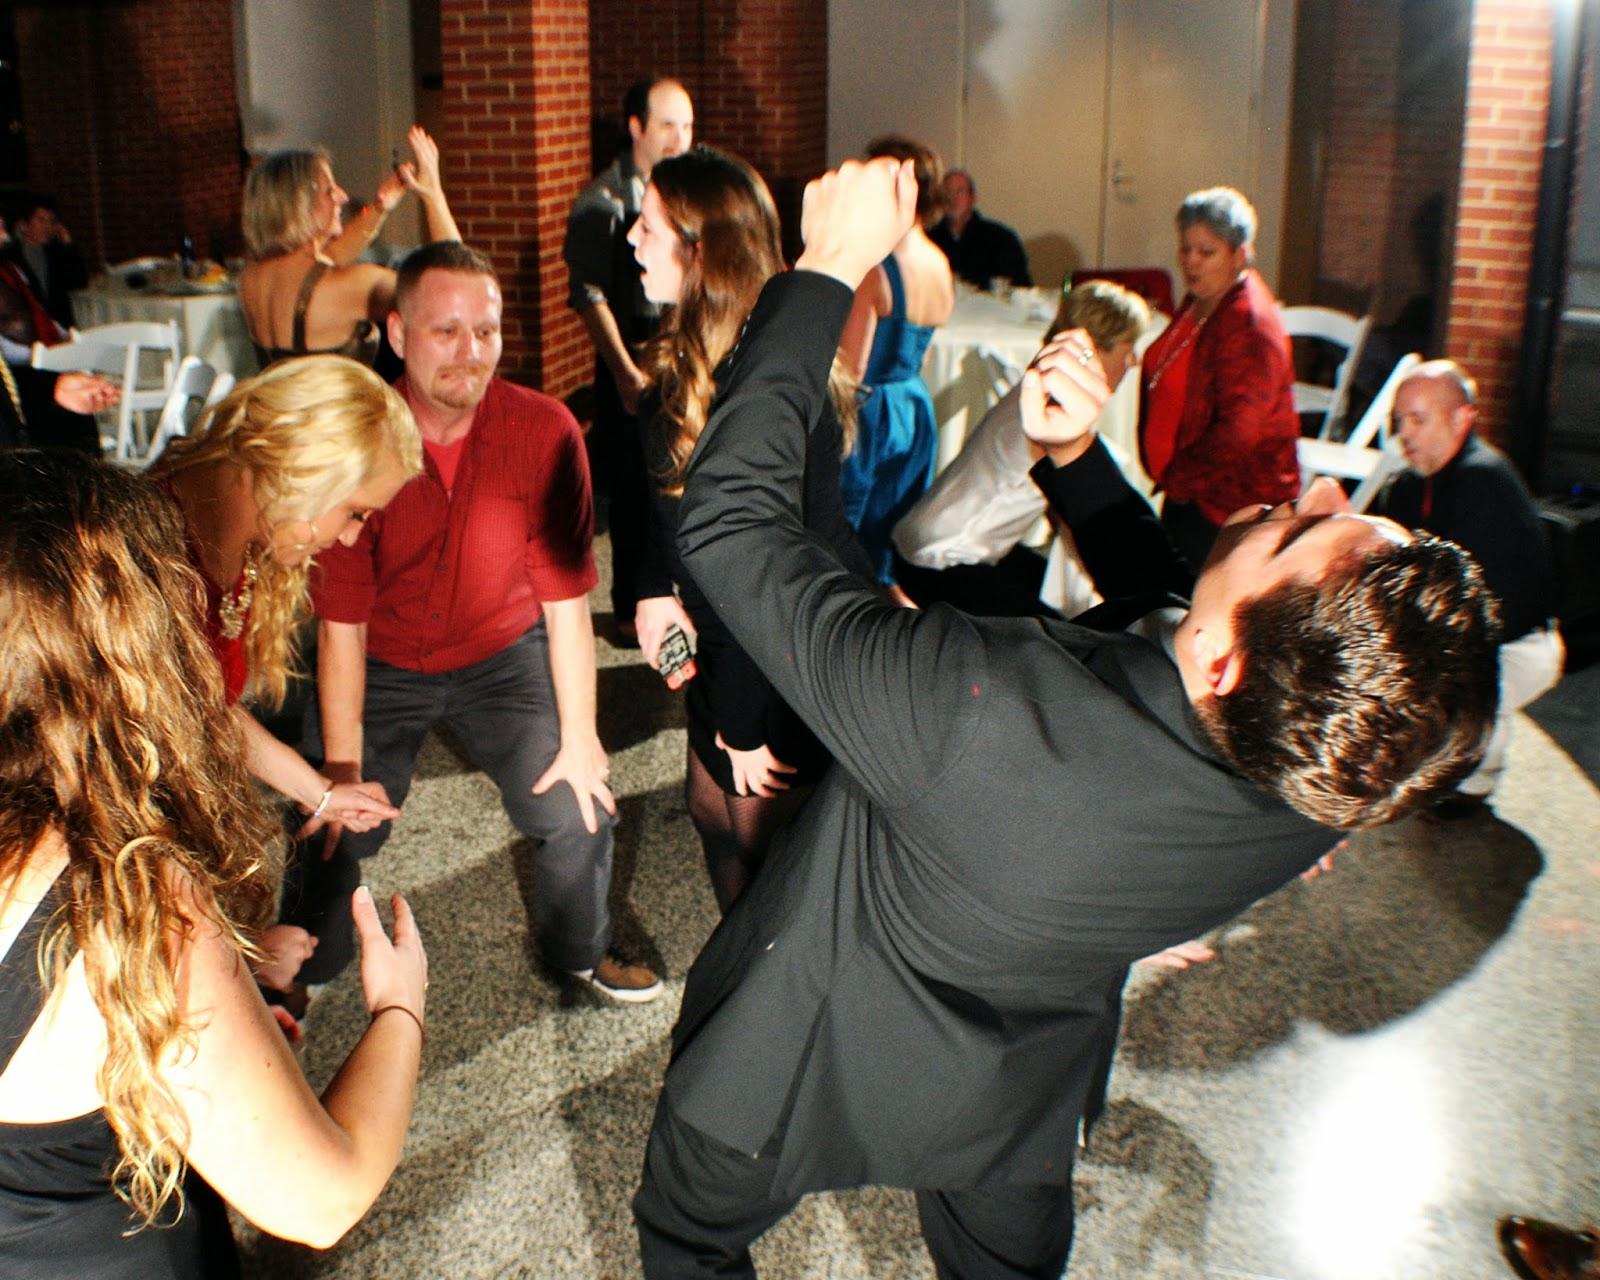 With Class LLC Wedding Coordinators, Wedding Planners, Wedding DJs, Party DJs, Chattanooga DJs, Cleveland DJs, Dalton DJs – IMAX – Chattanooga, TN